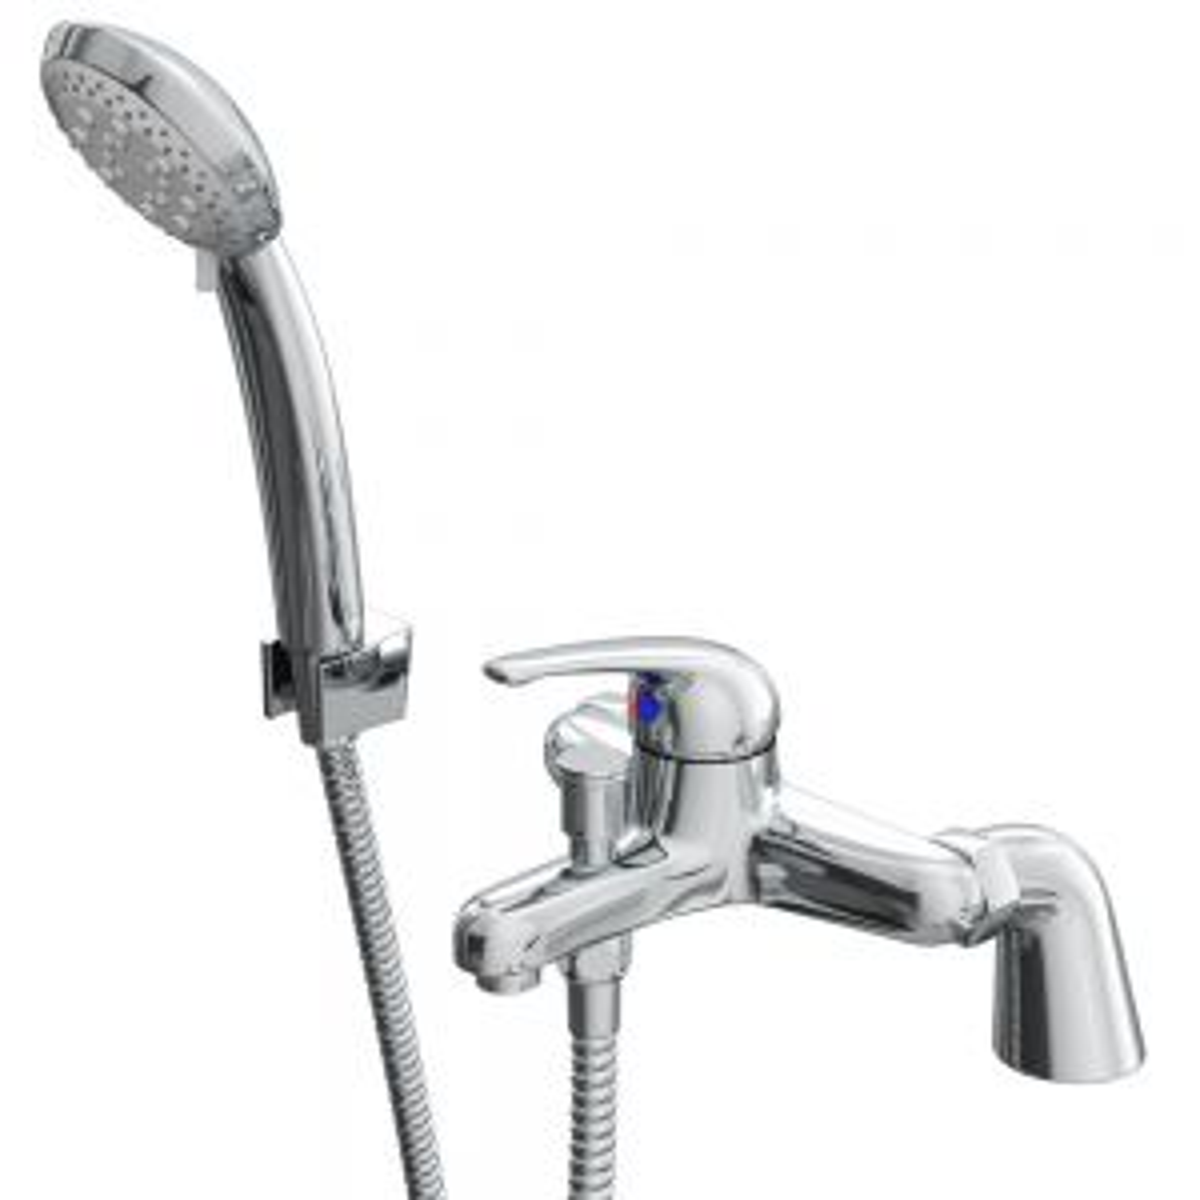 Zenith Rio Bath Shower Mixer Tap